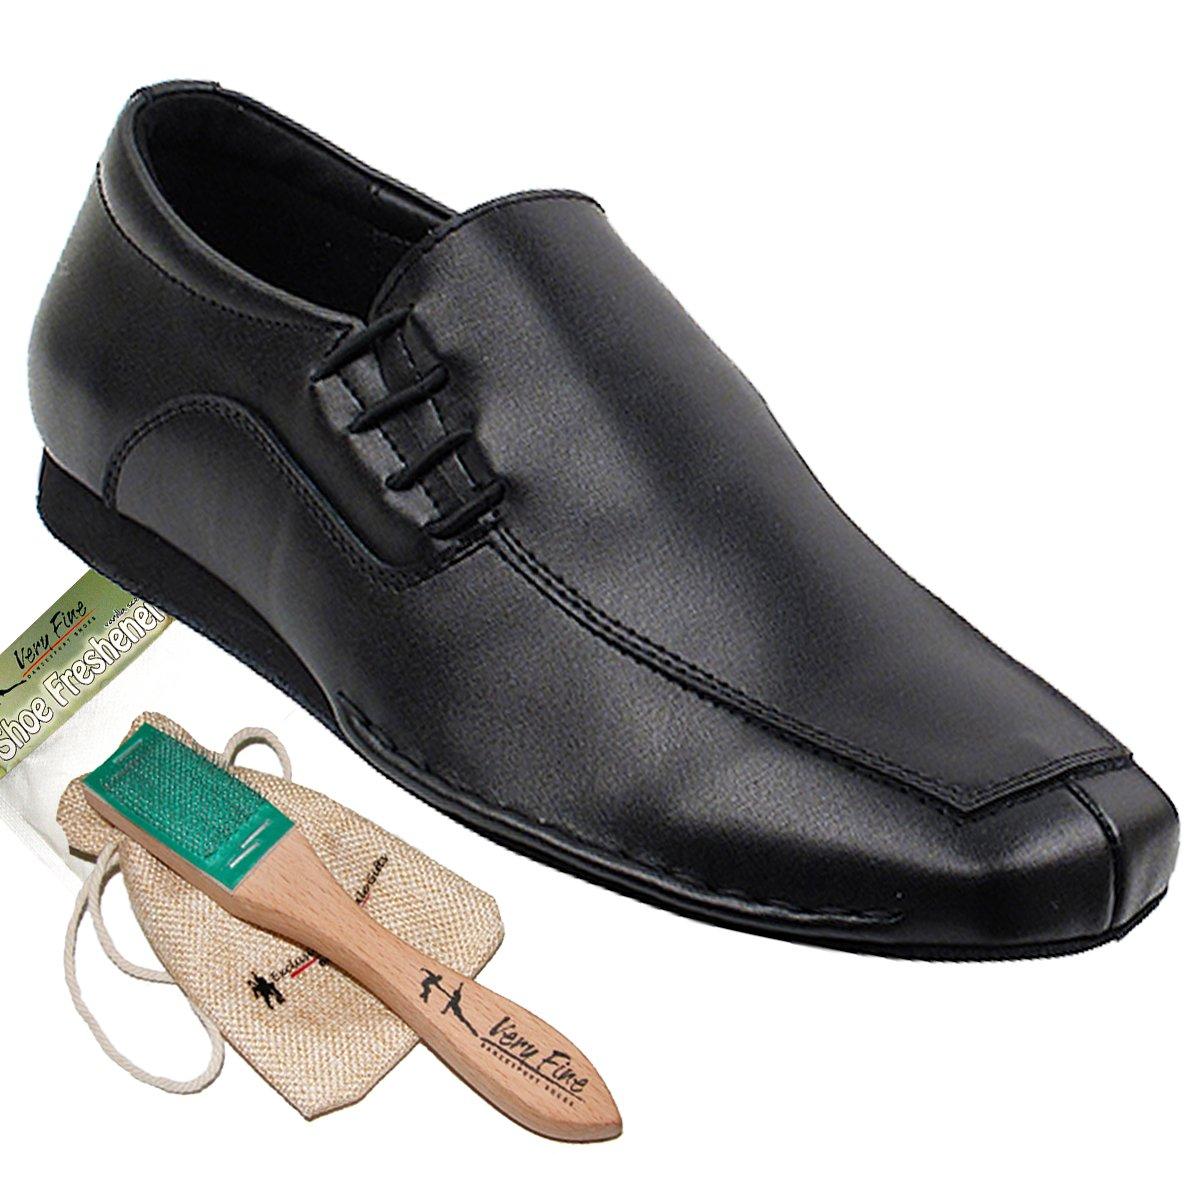 Men's Ballroom Dance Shoes Salsa Tango Latin Shoes Black Leather SERO102BBXEB Comfortable - Very Fine 9.5 M US [Bundle of 5]